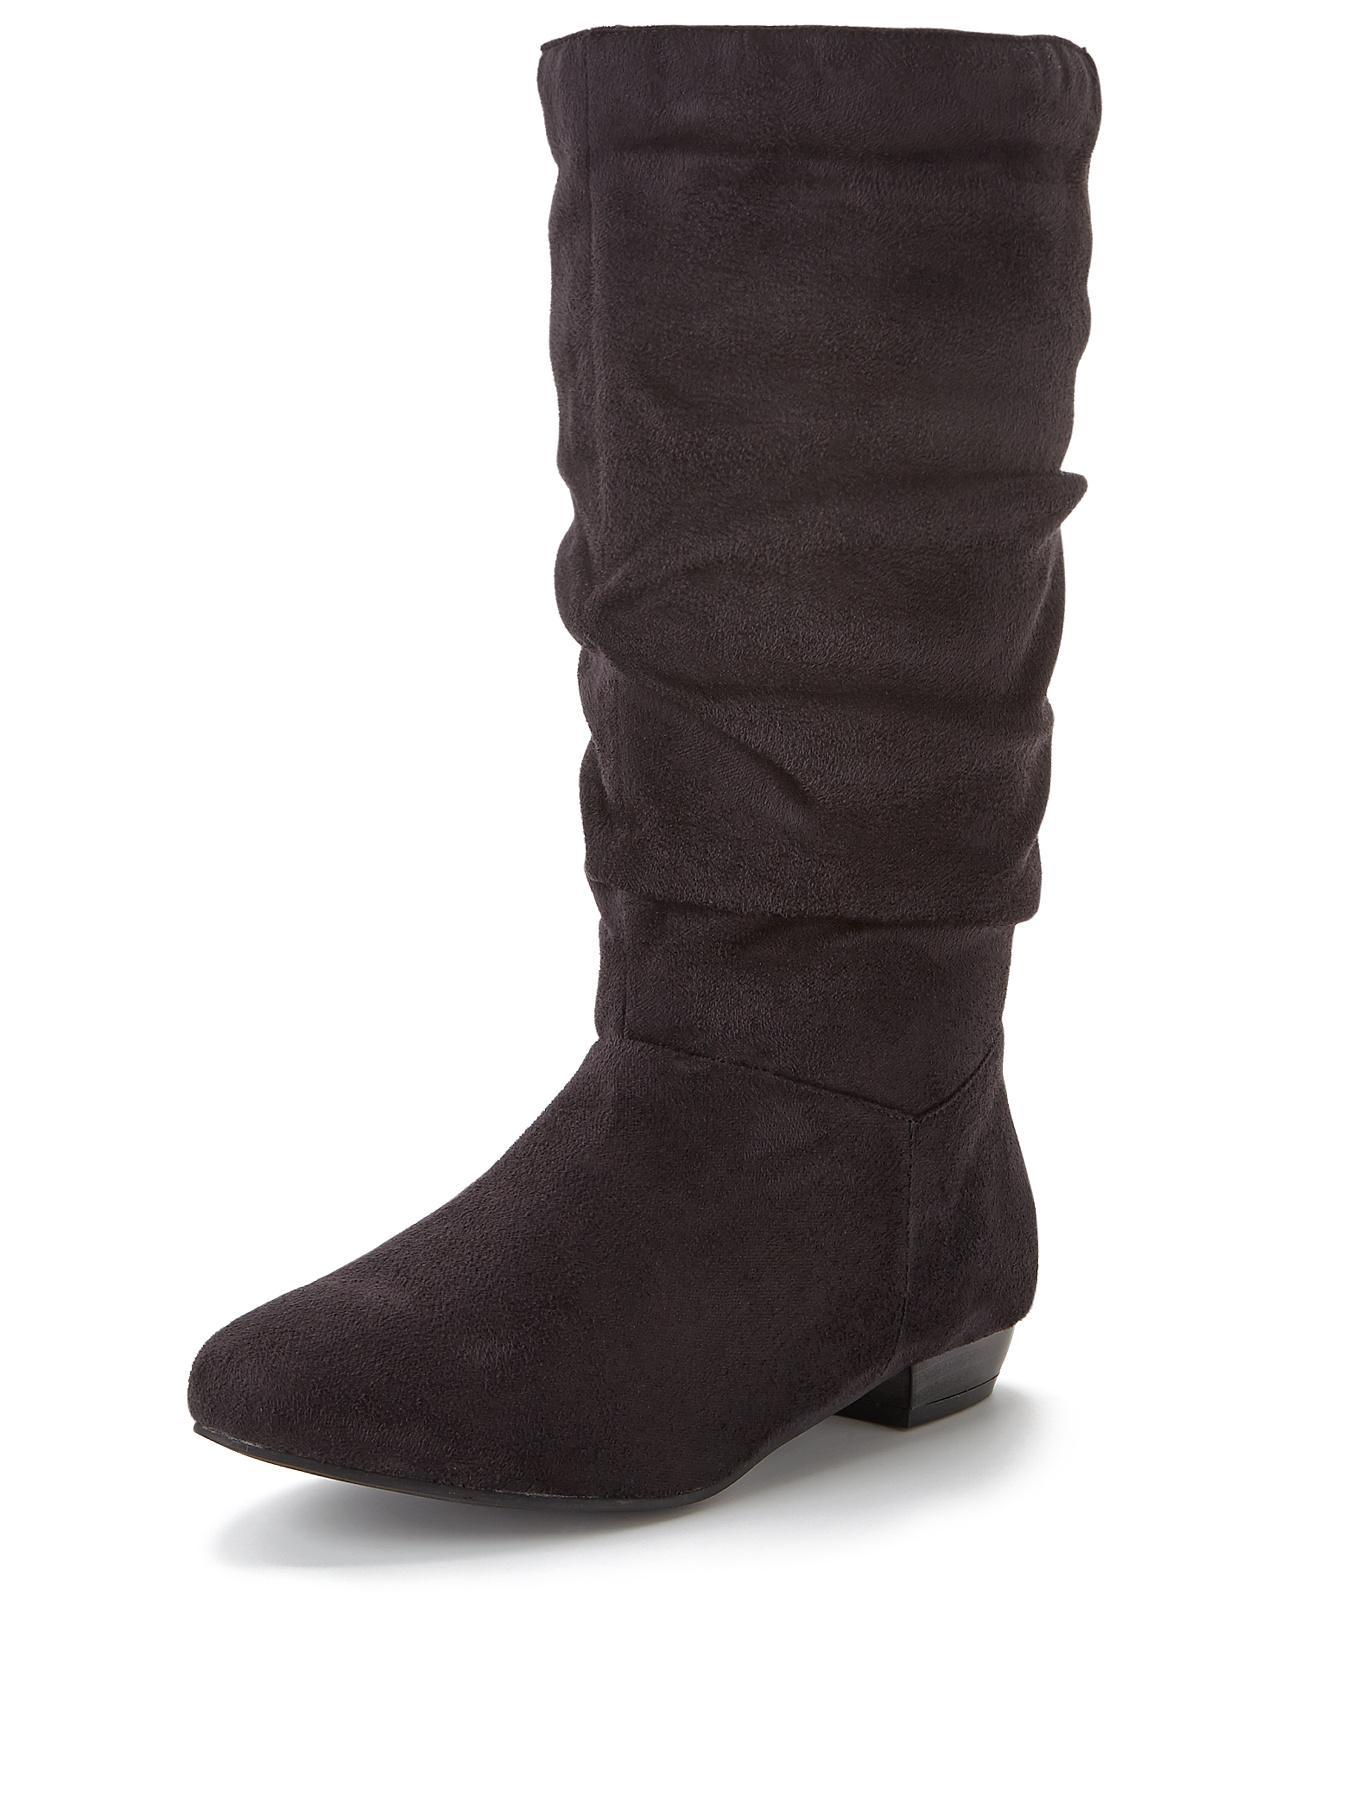 Melissa Flat Slouch Calf Boots Black